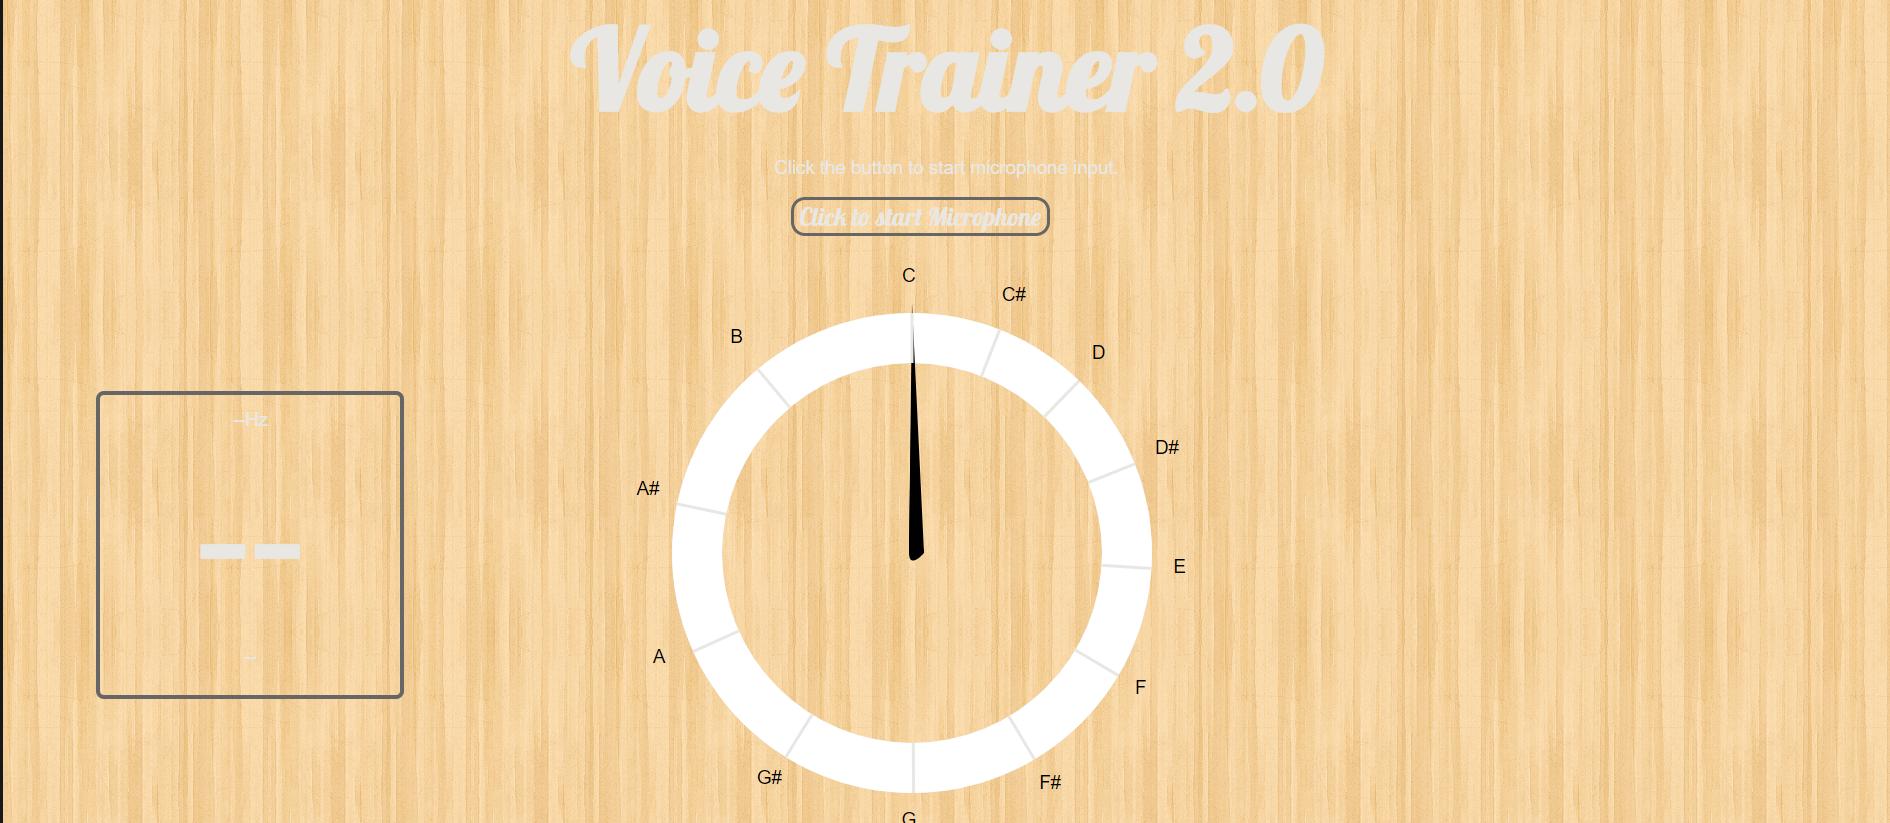 voiceTrainerapp